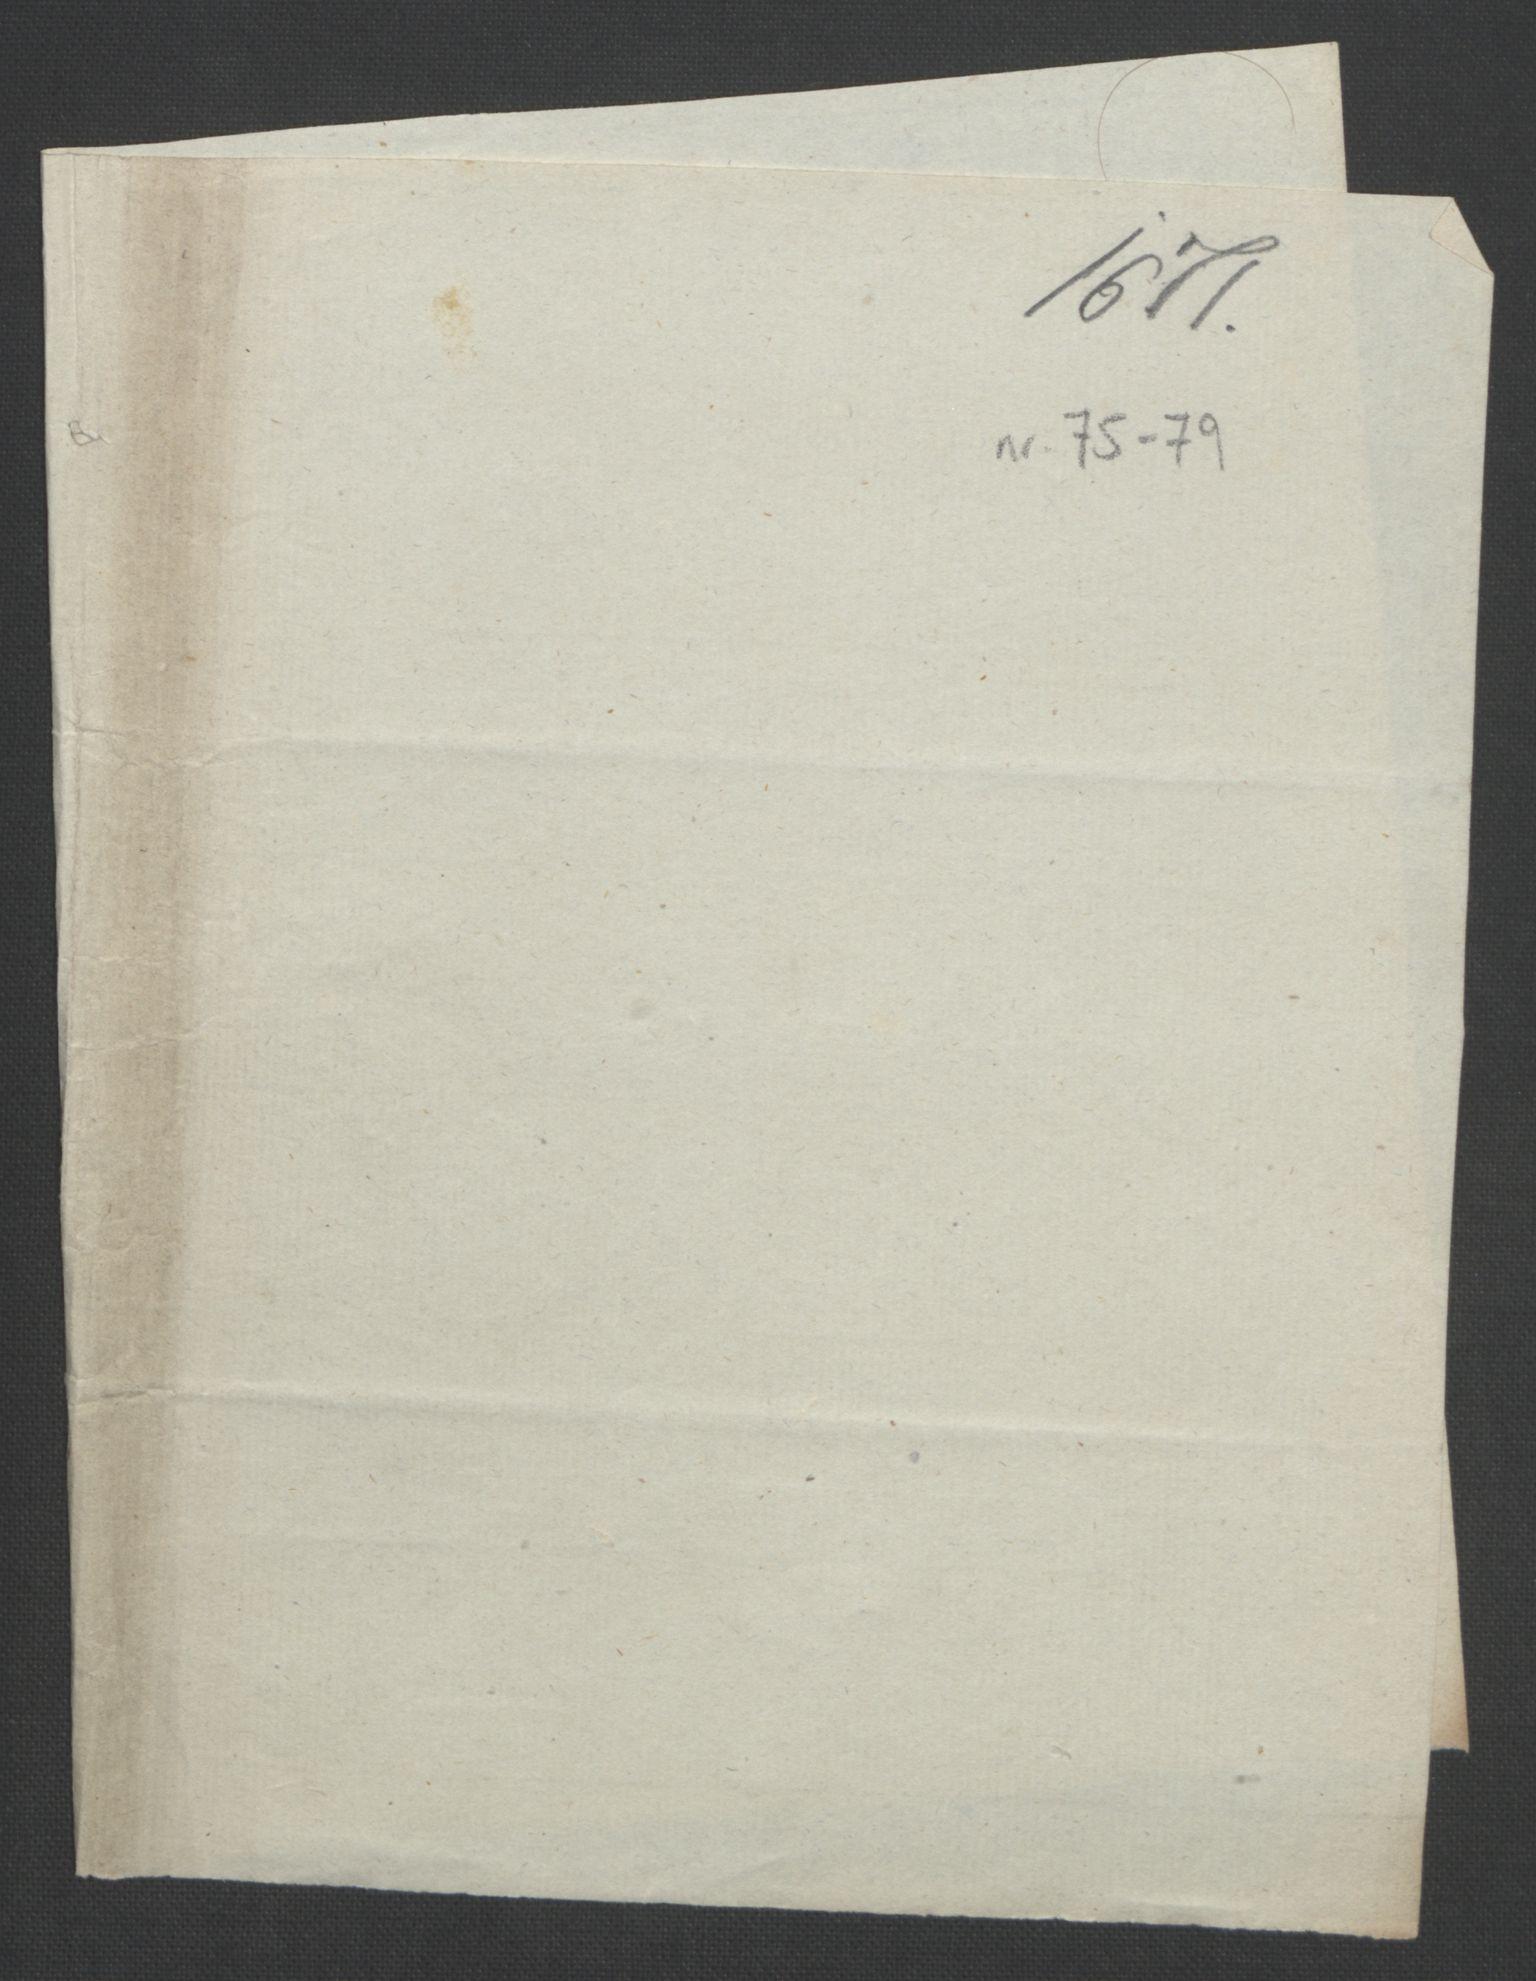 RA, Rentekammeret inntil 1814, Reviderte regnskaper, Fogderegnskap, R32/L1842: Fogderegnskap Jarlsberg grevskap, 1664-1673, s. 184